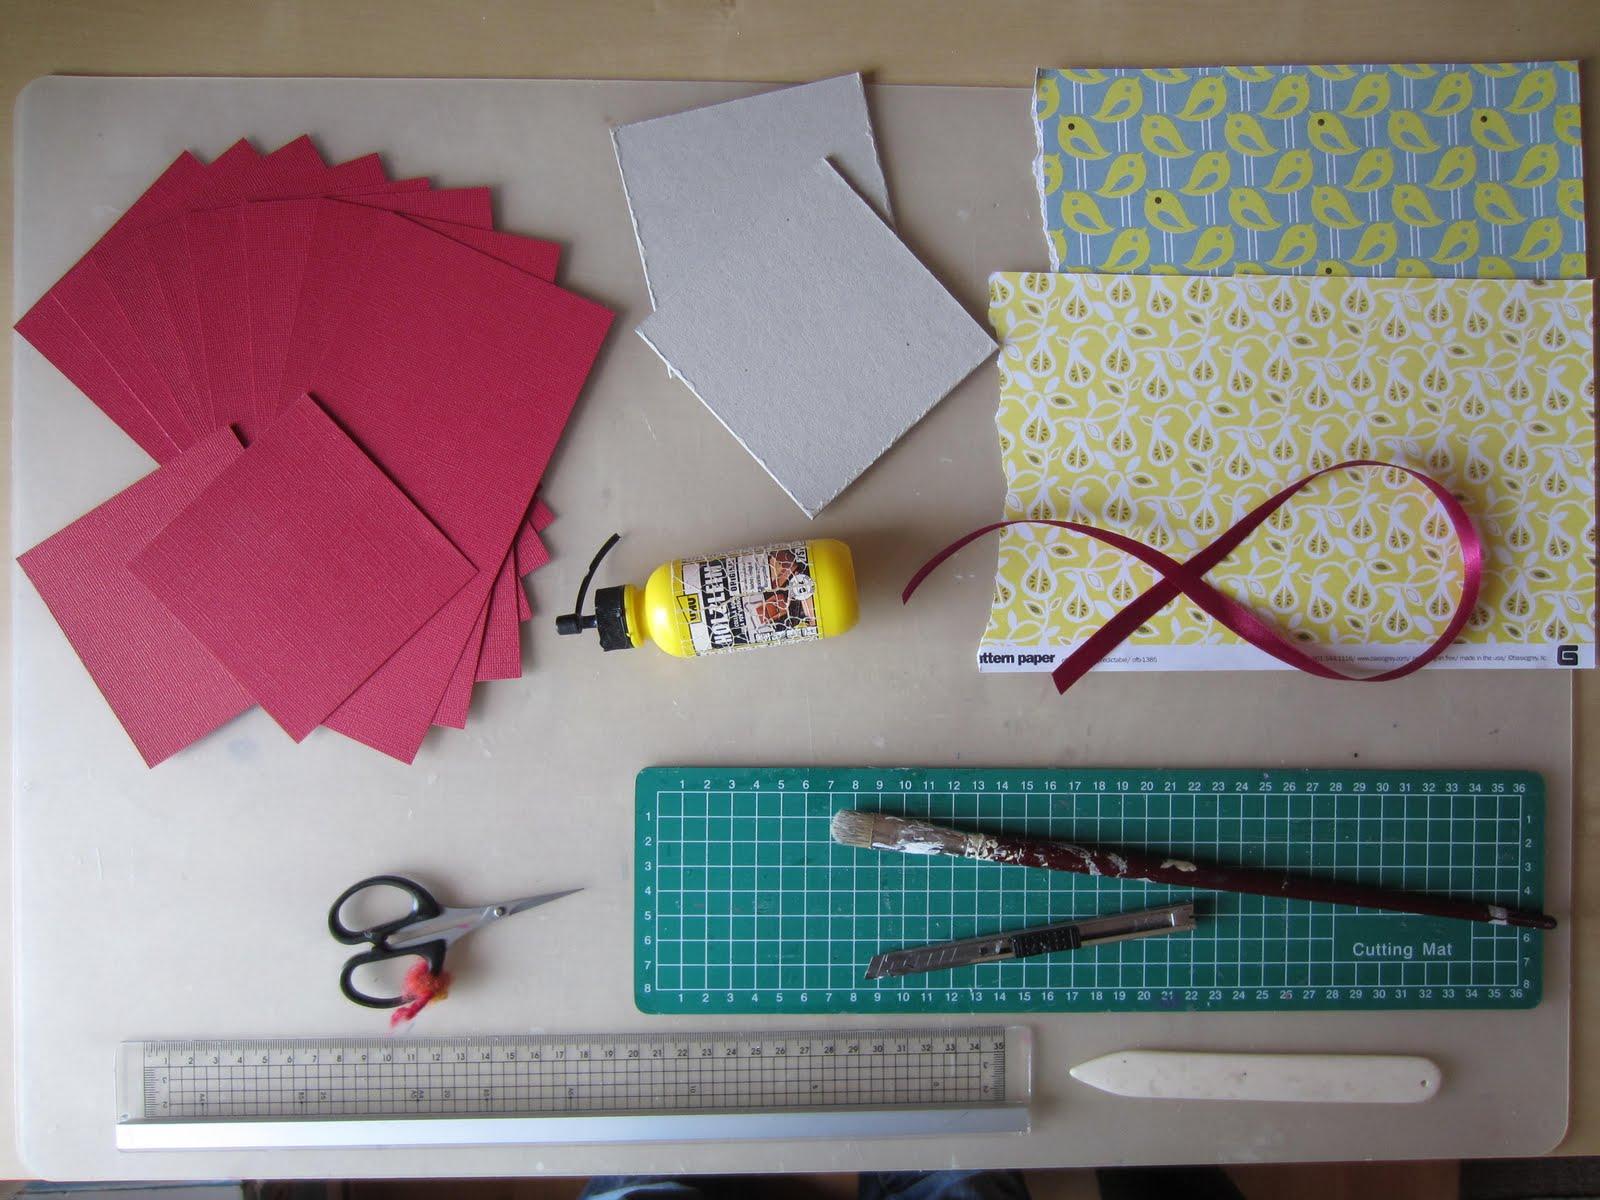 Fabulous Papierkatze: Ein Leporello selber basteln? Hier folgt die genaue KC43